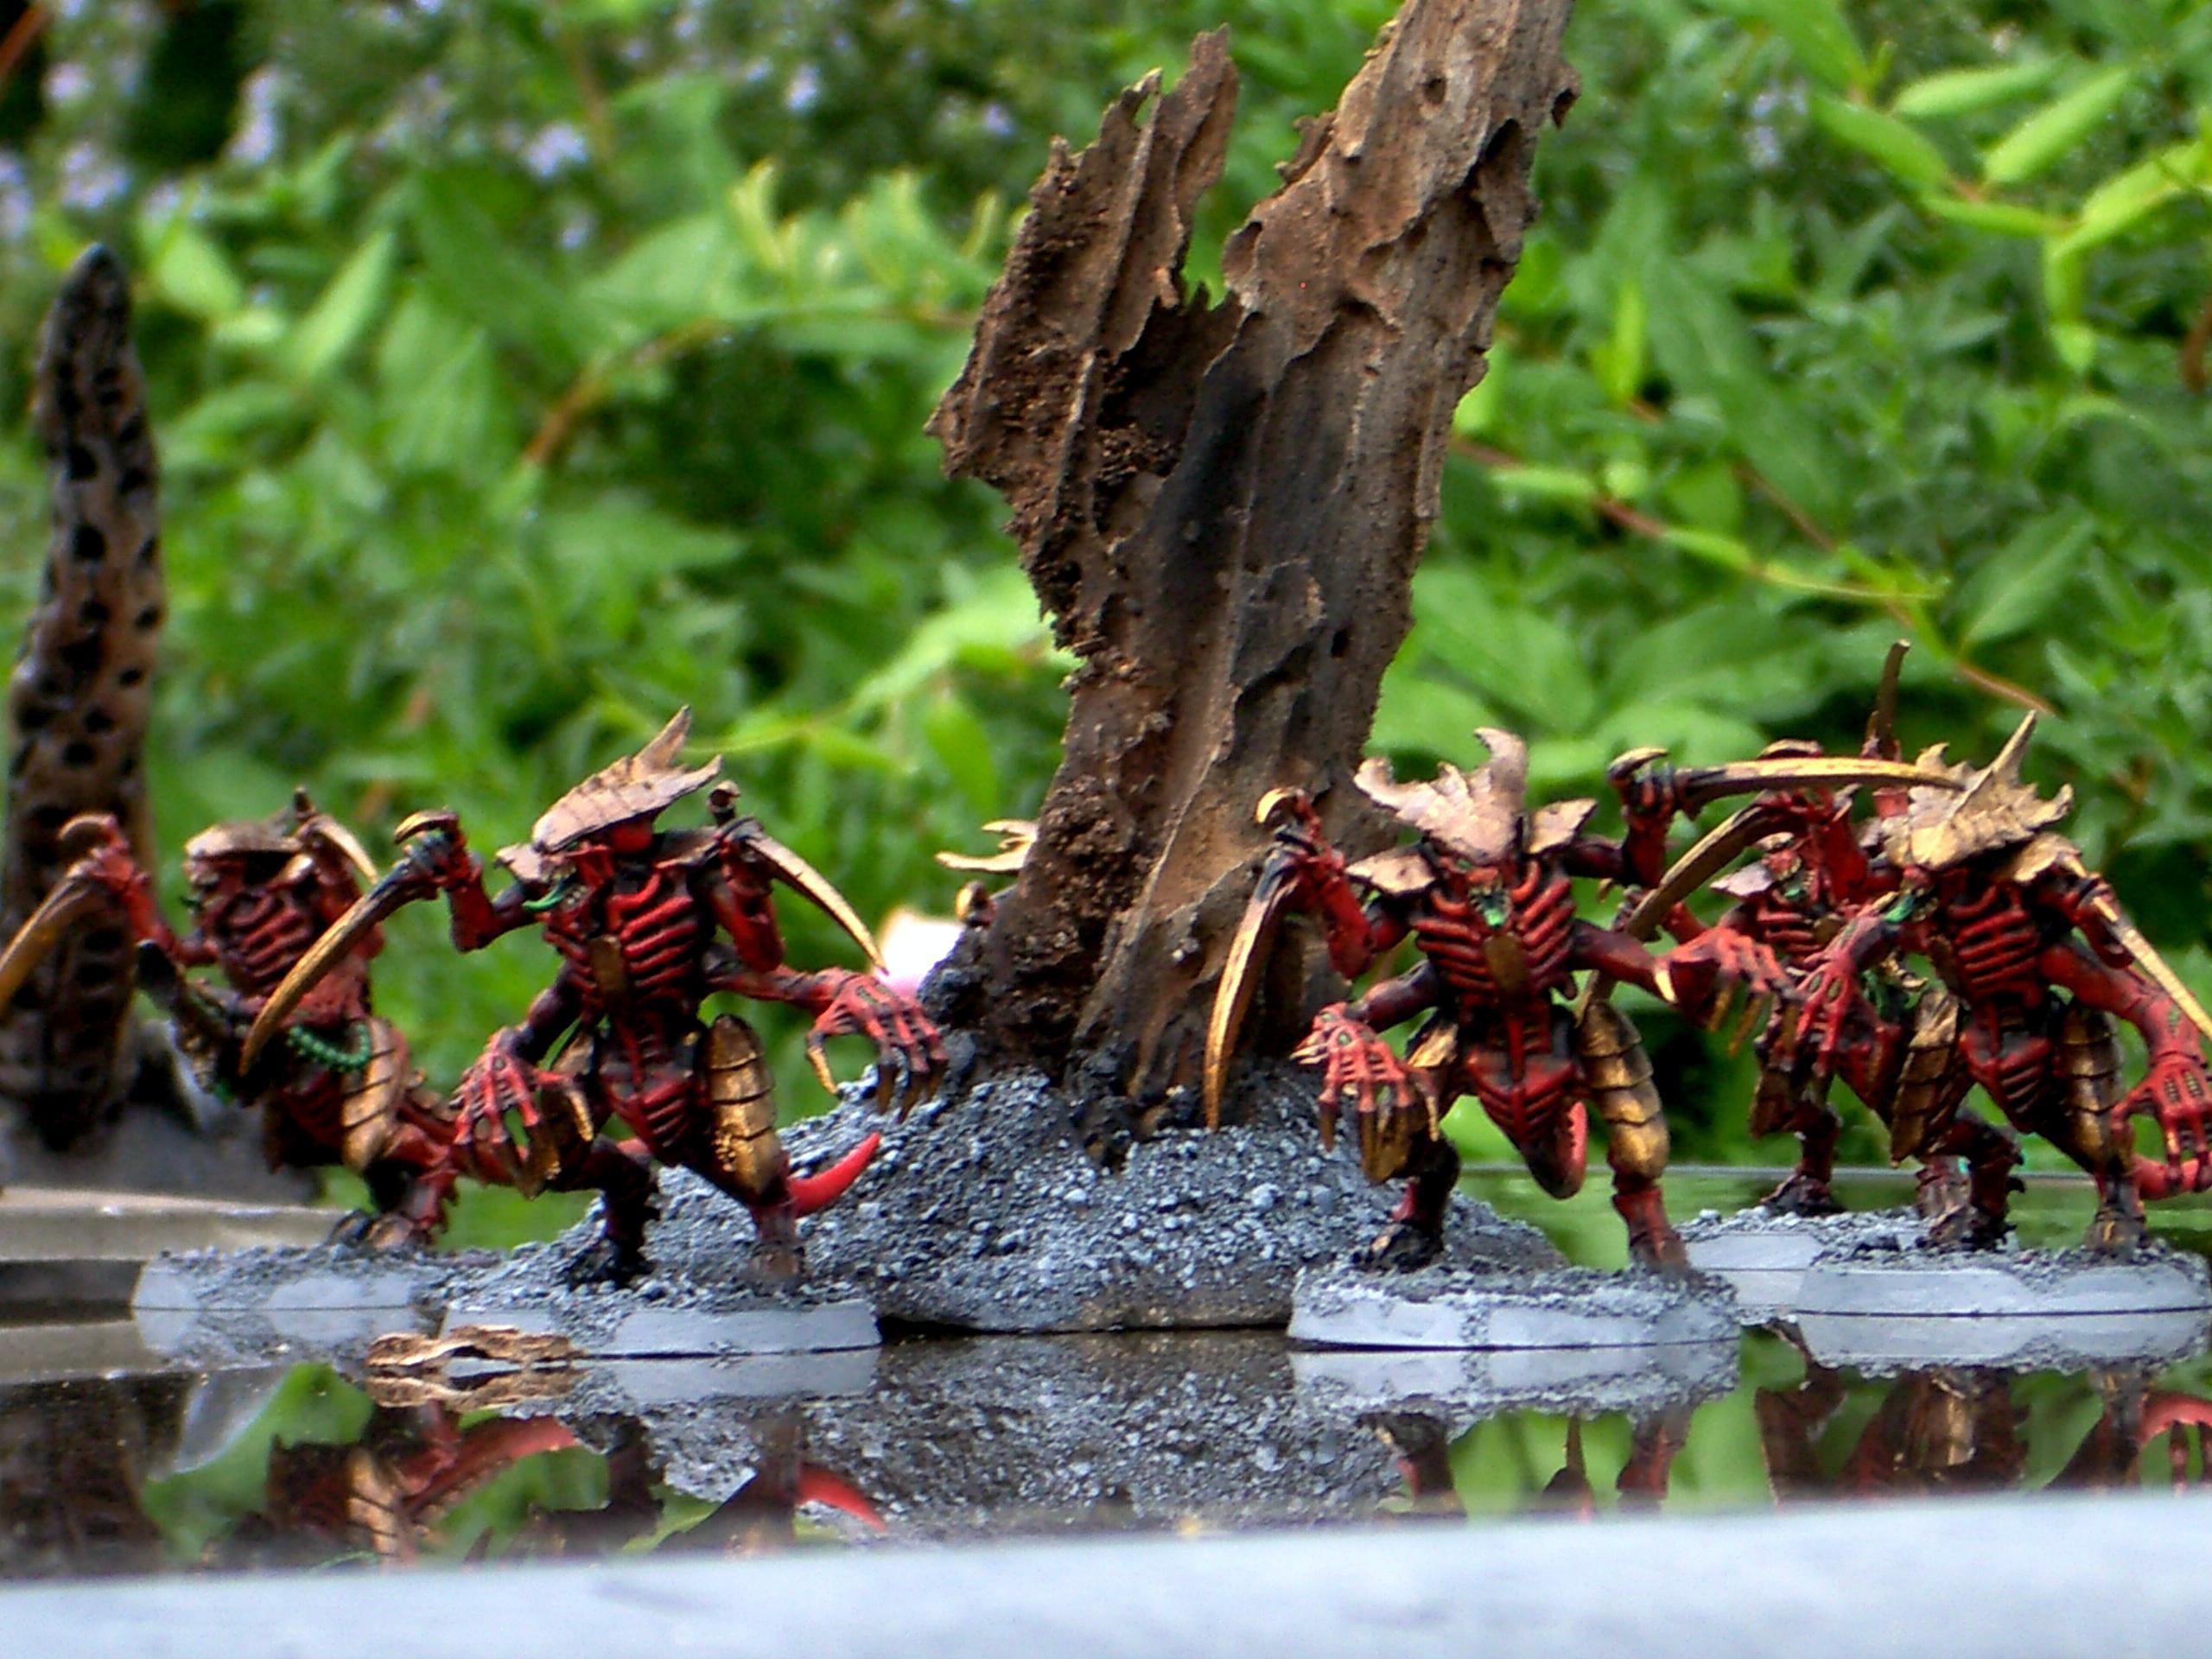 Tyranids Warriors Carnifax Bugs